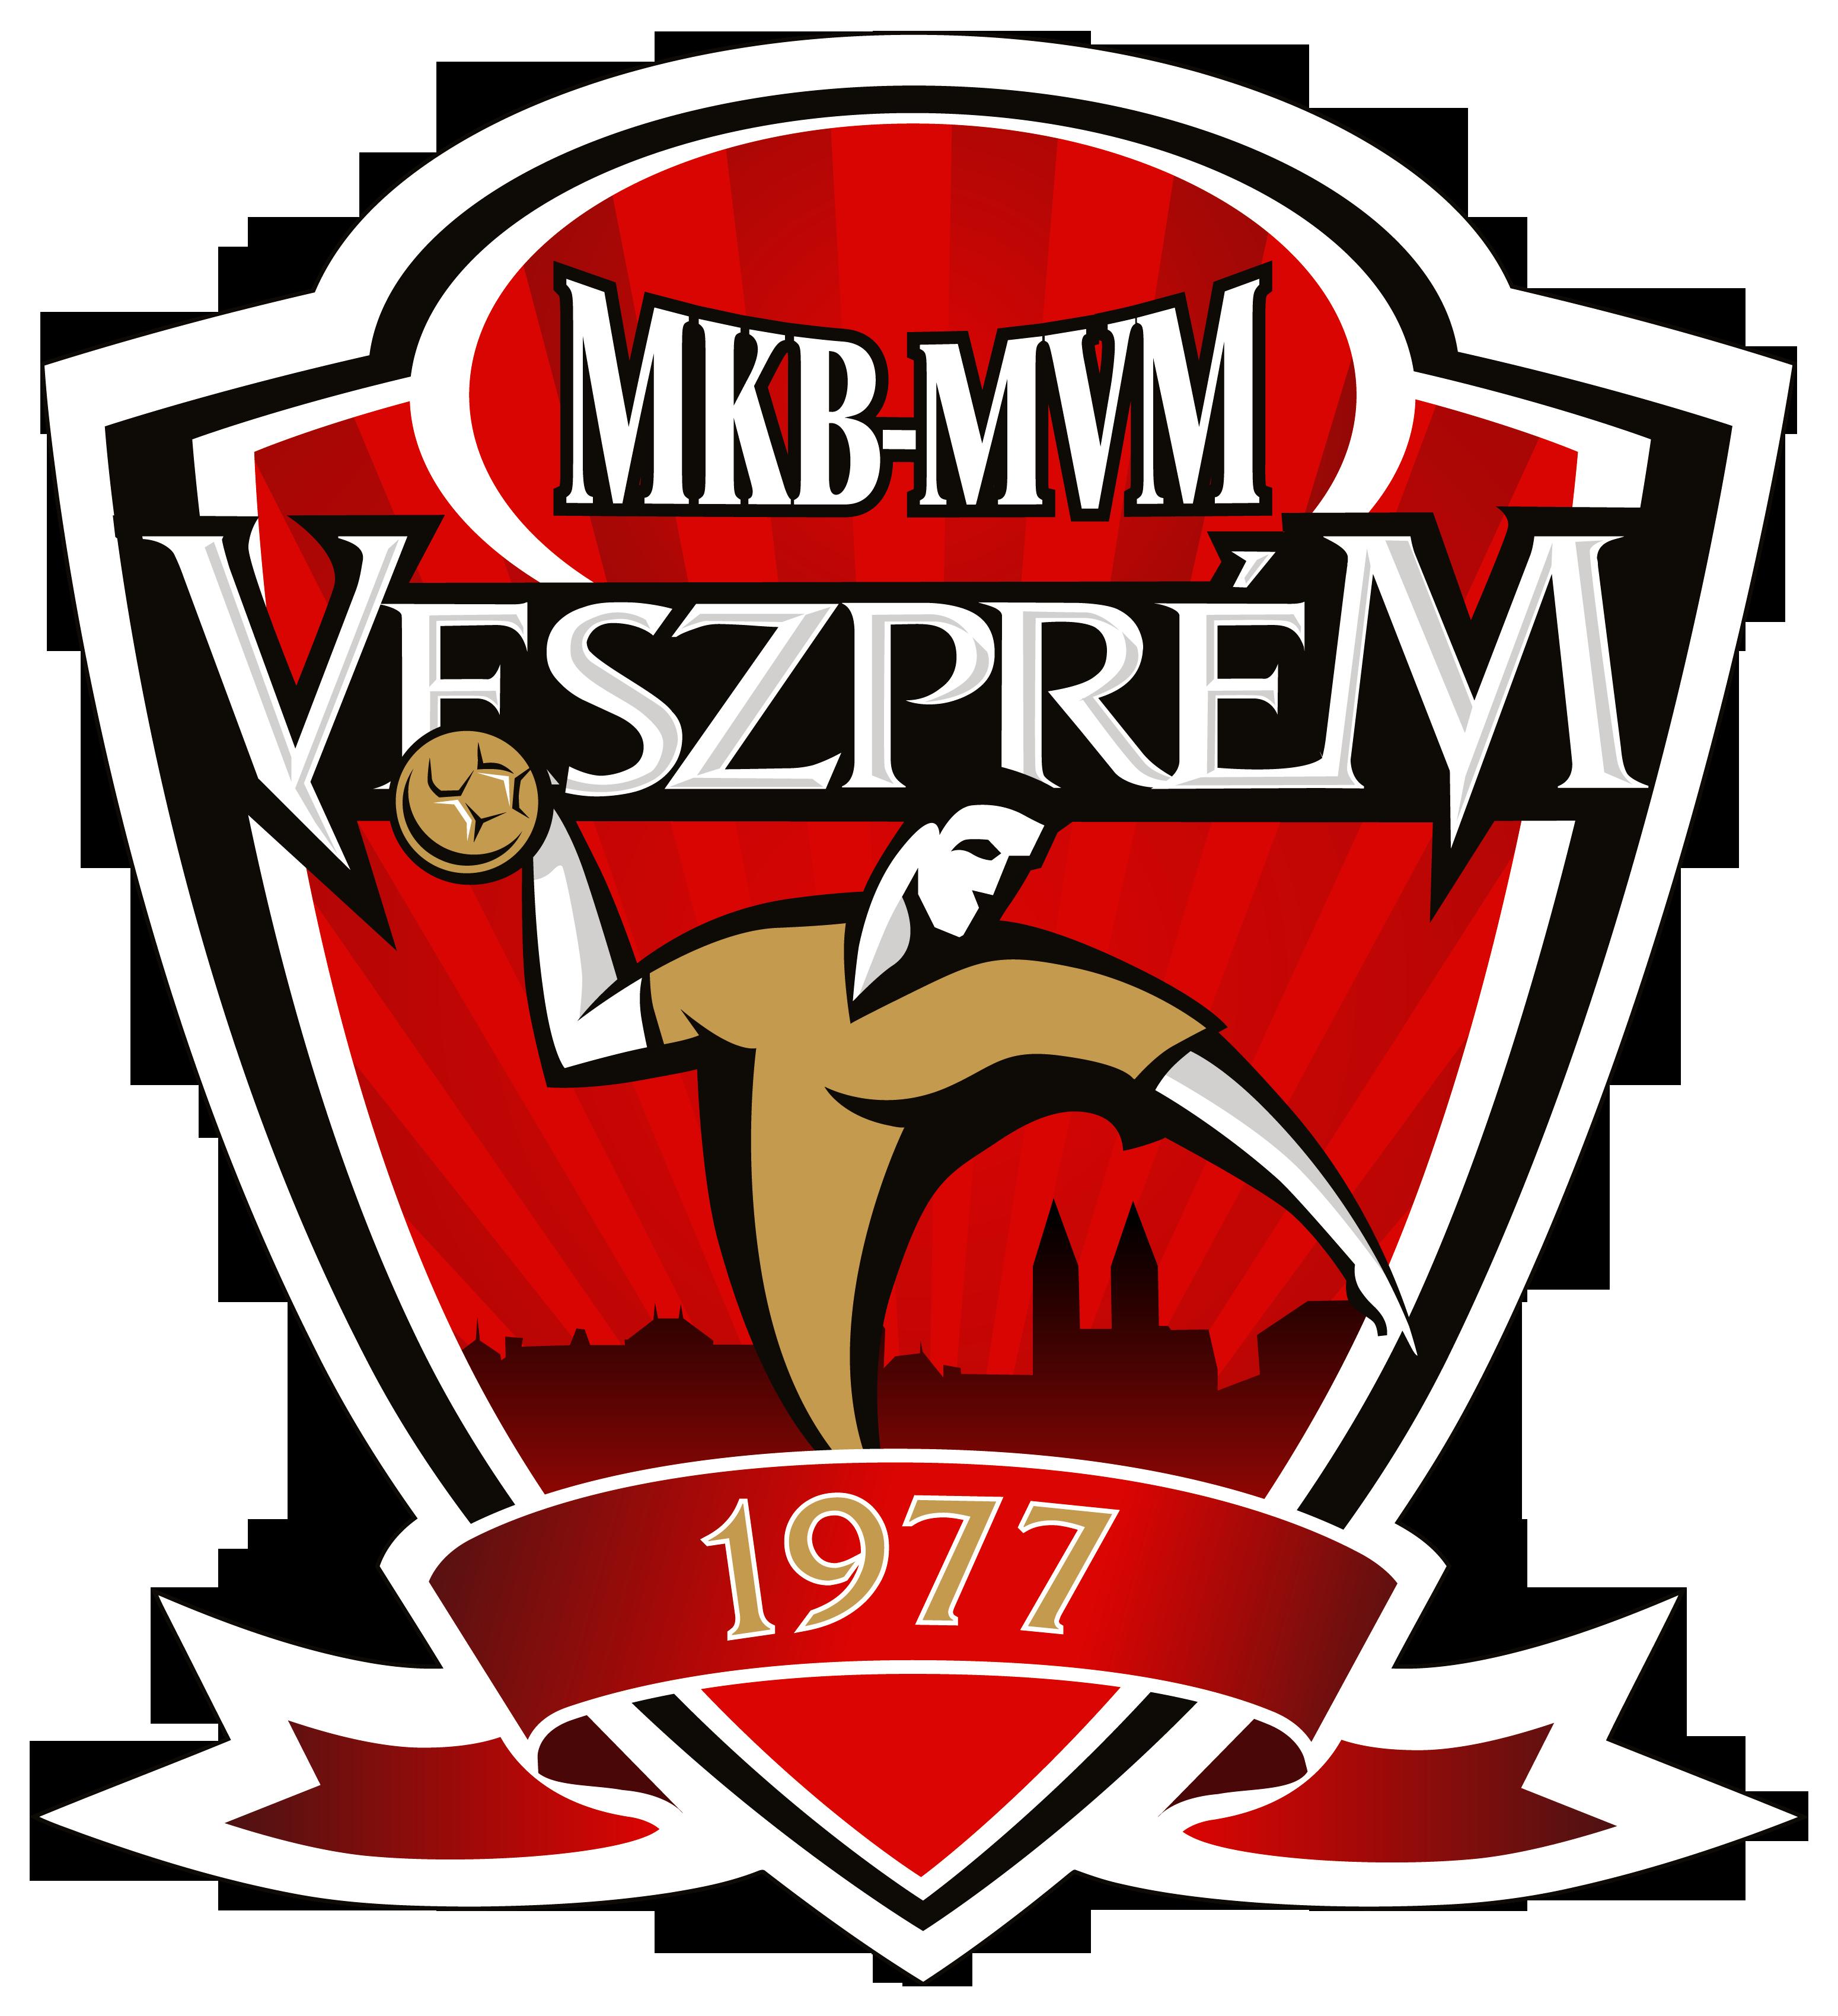 MKB-MVM Veszprém Logo photo - 1